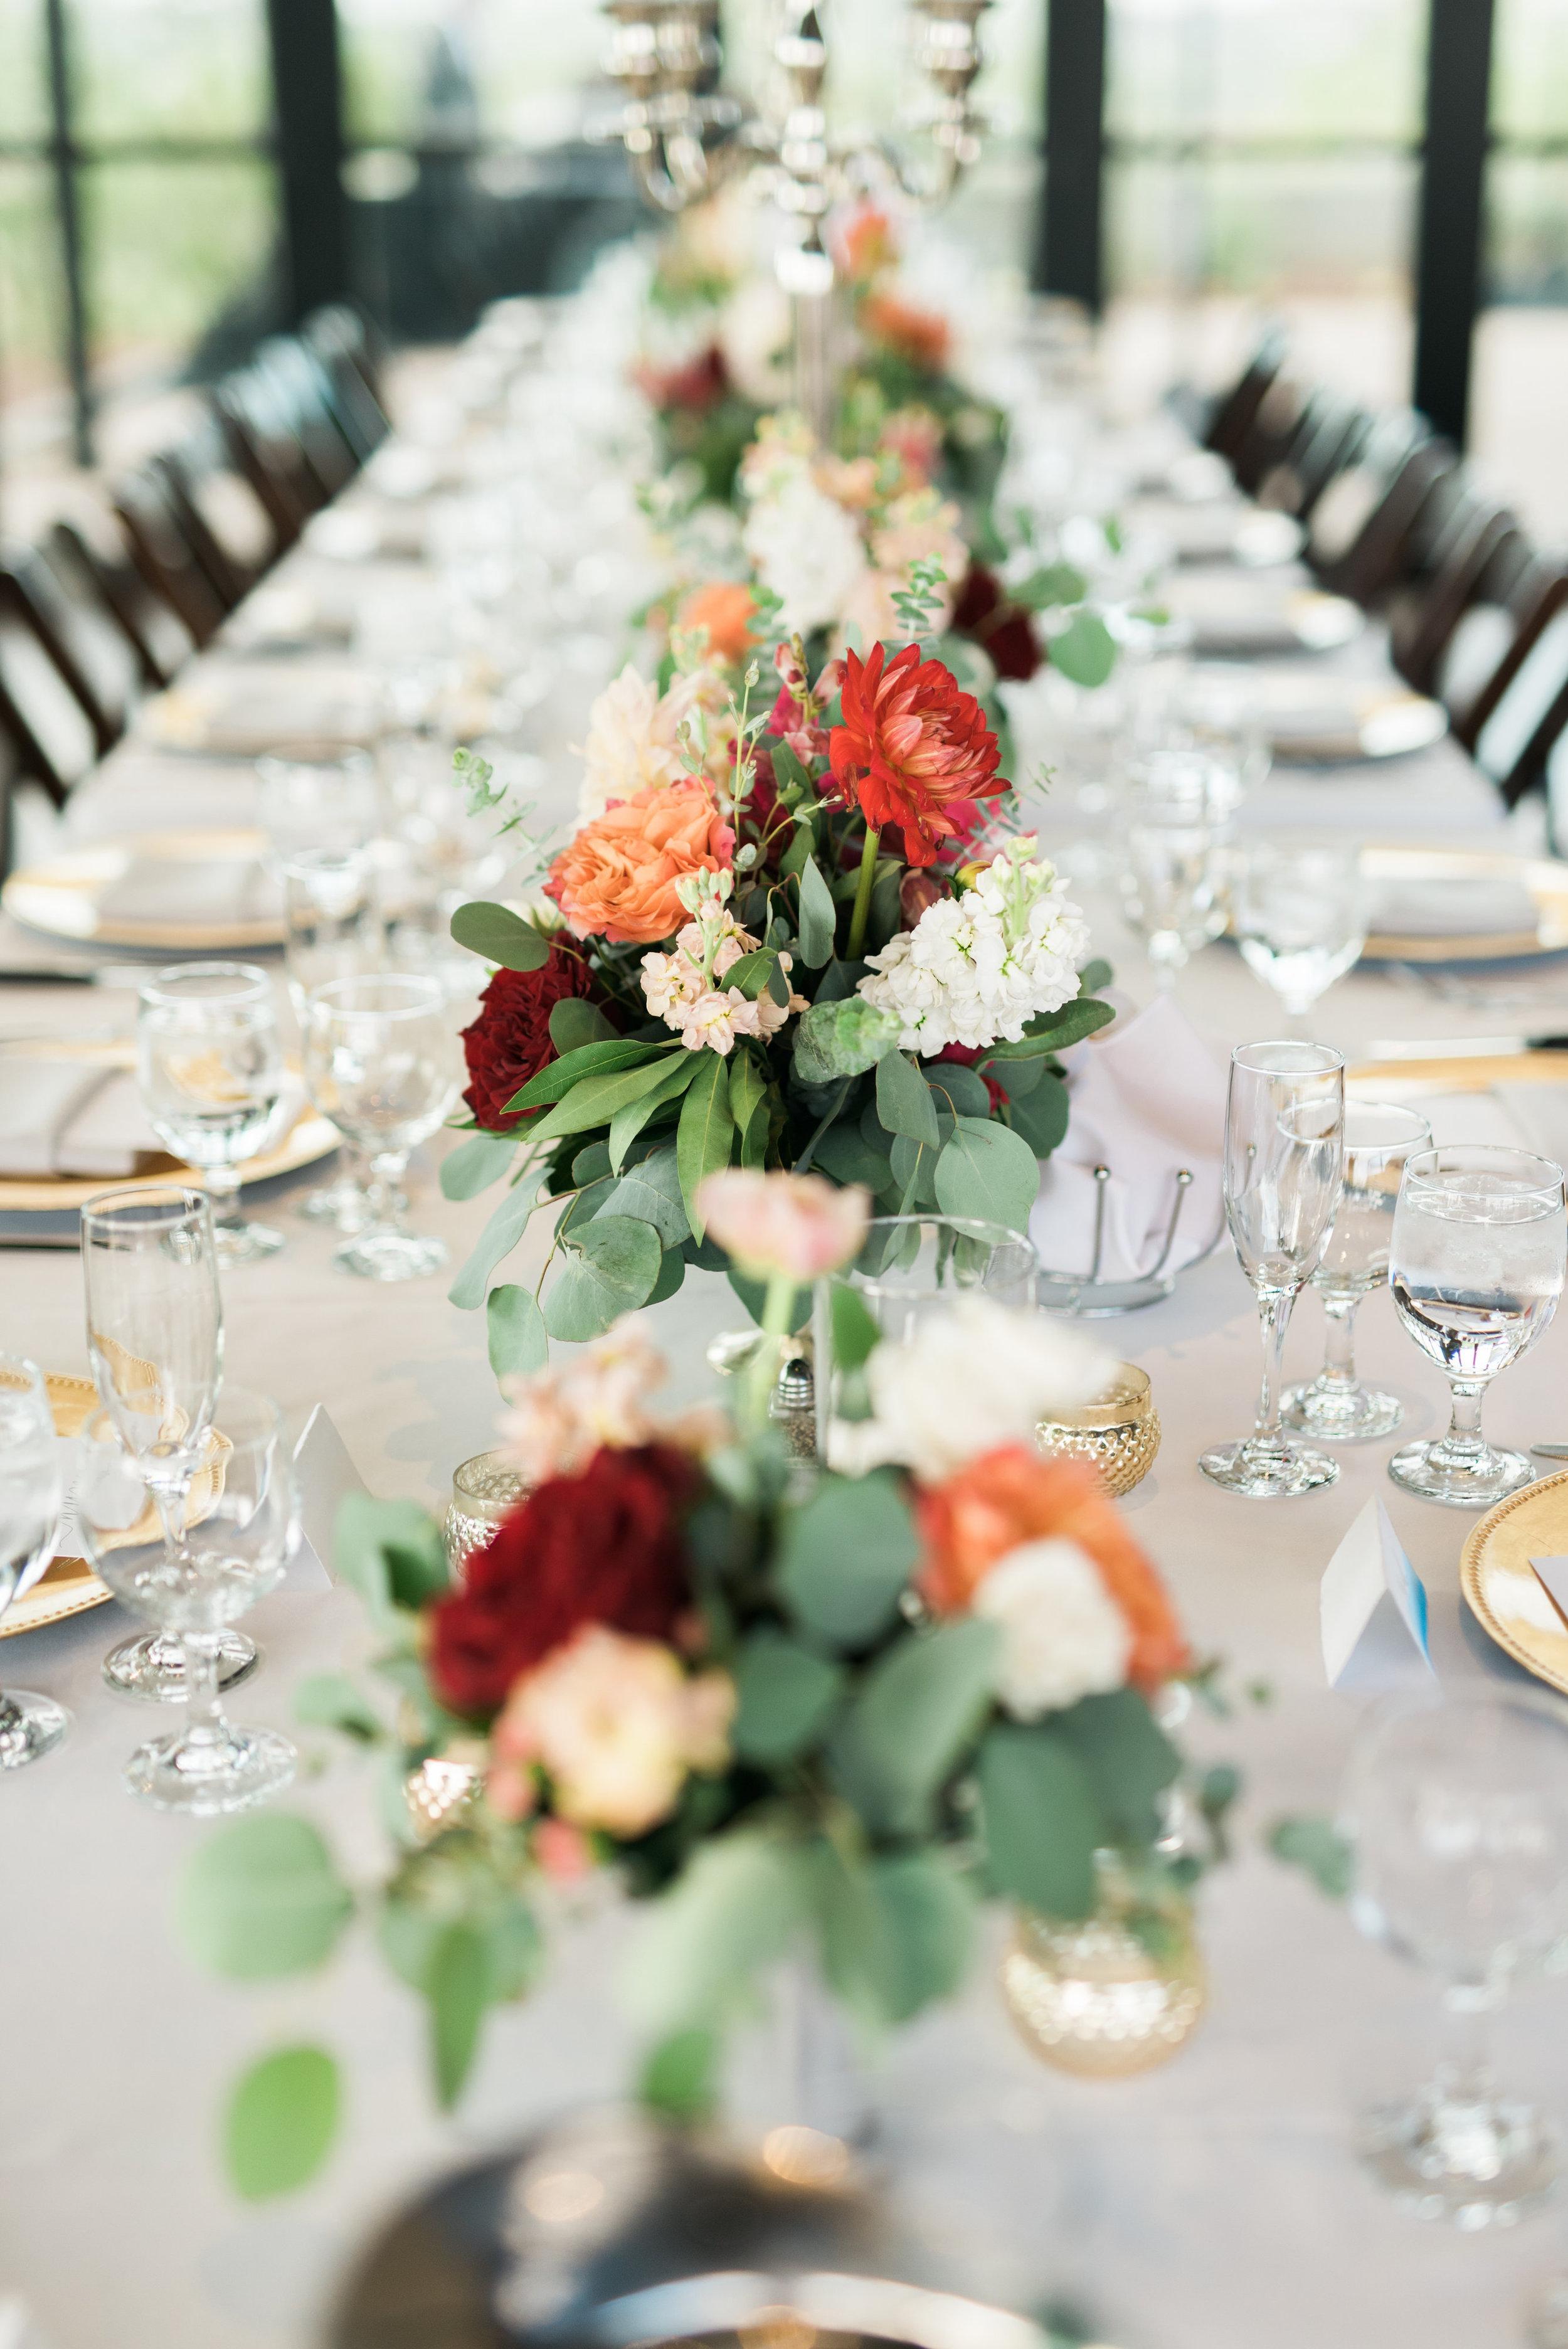 wedding centerpiece, white wedding linens, gold chargers, garden wedding flowers, red wedding flowers, peach wedding flowers, ivory wedding flowers, blush wedding flowers, silver candleabras, mercury glass